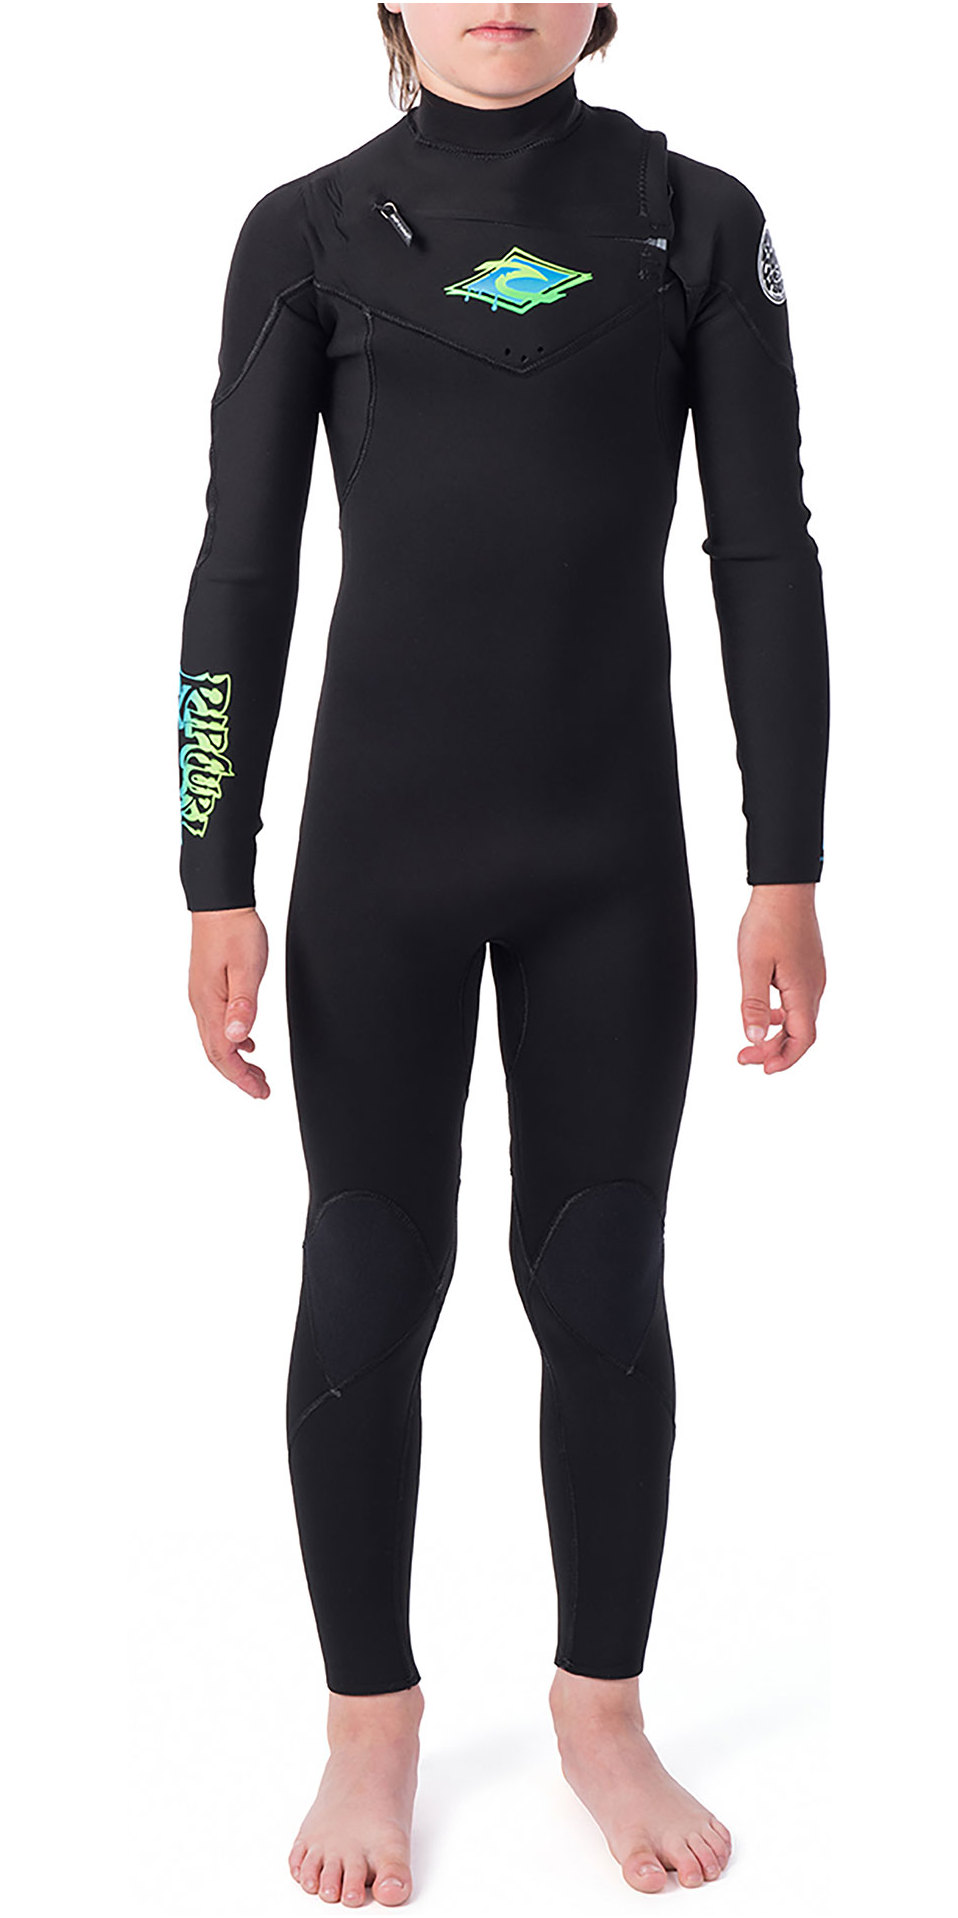 2019 Rip Curl Junior Dawn Patrol 5/3mm Chest Zip Wetsuit Black / Green WSM9PB